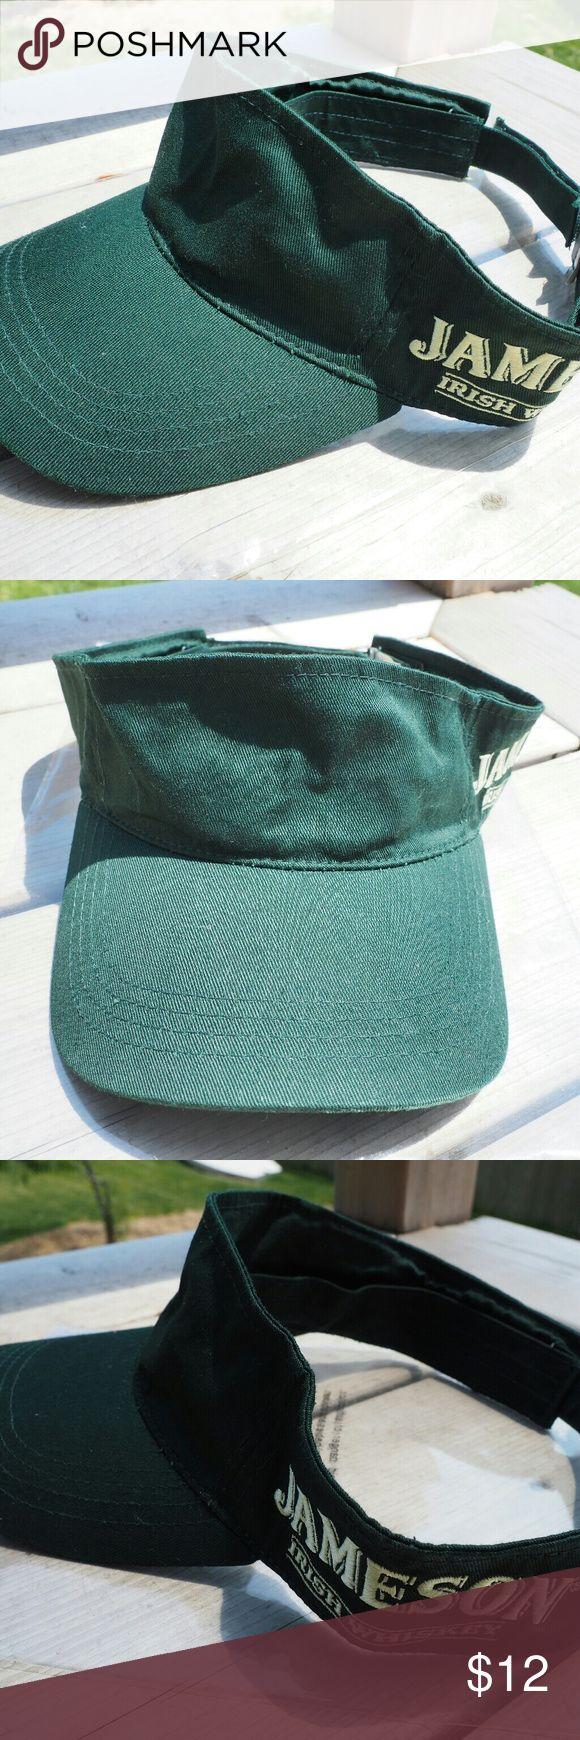 Jameson Irish Whiskey Golf Visor Green Velcro Adjustable Visor  Jameson Irish Whiskey Logo script on the side Accessories Hats